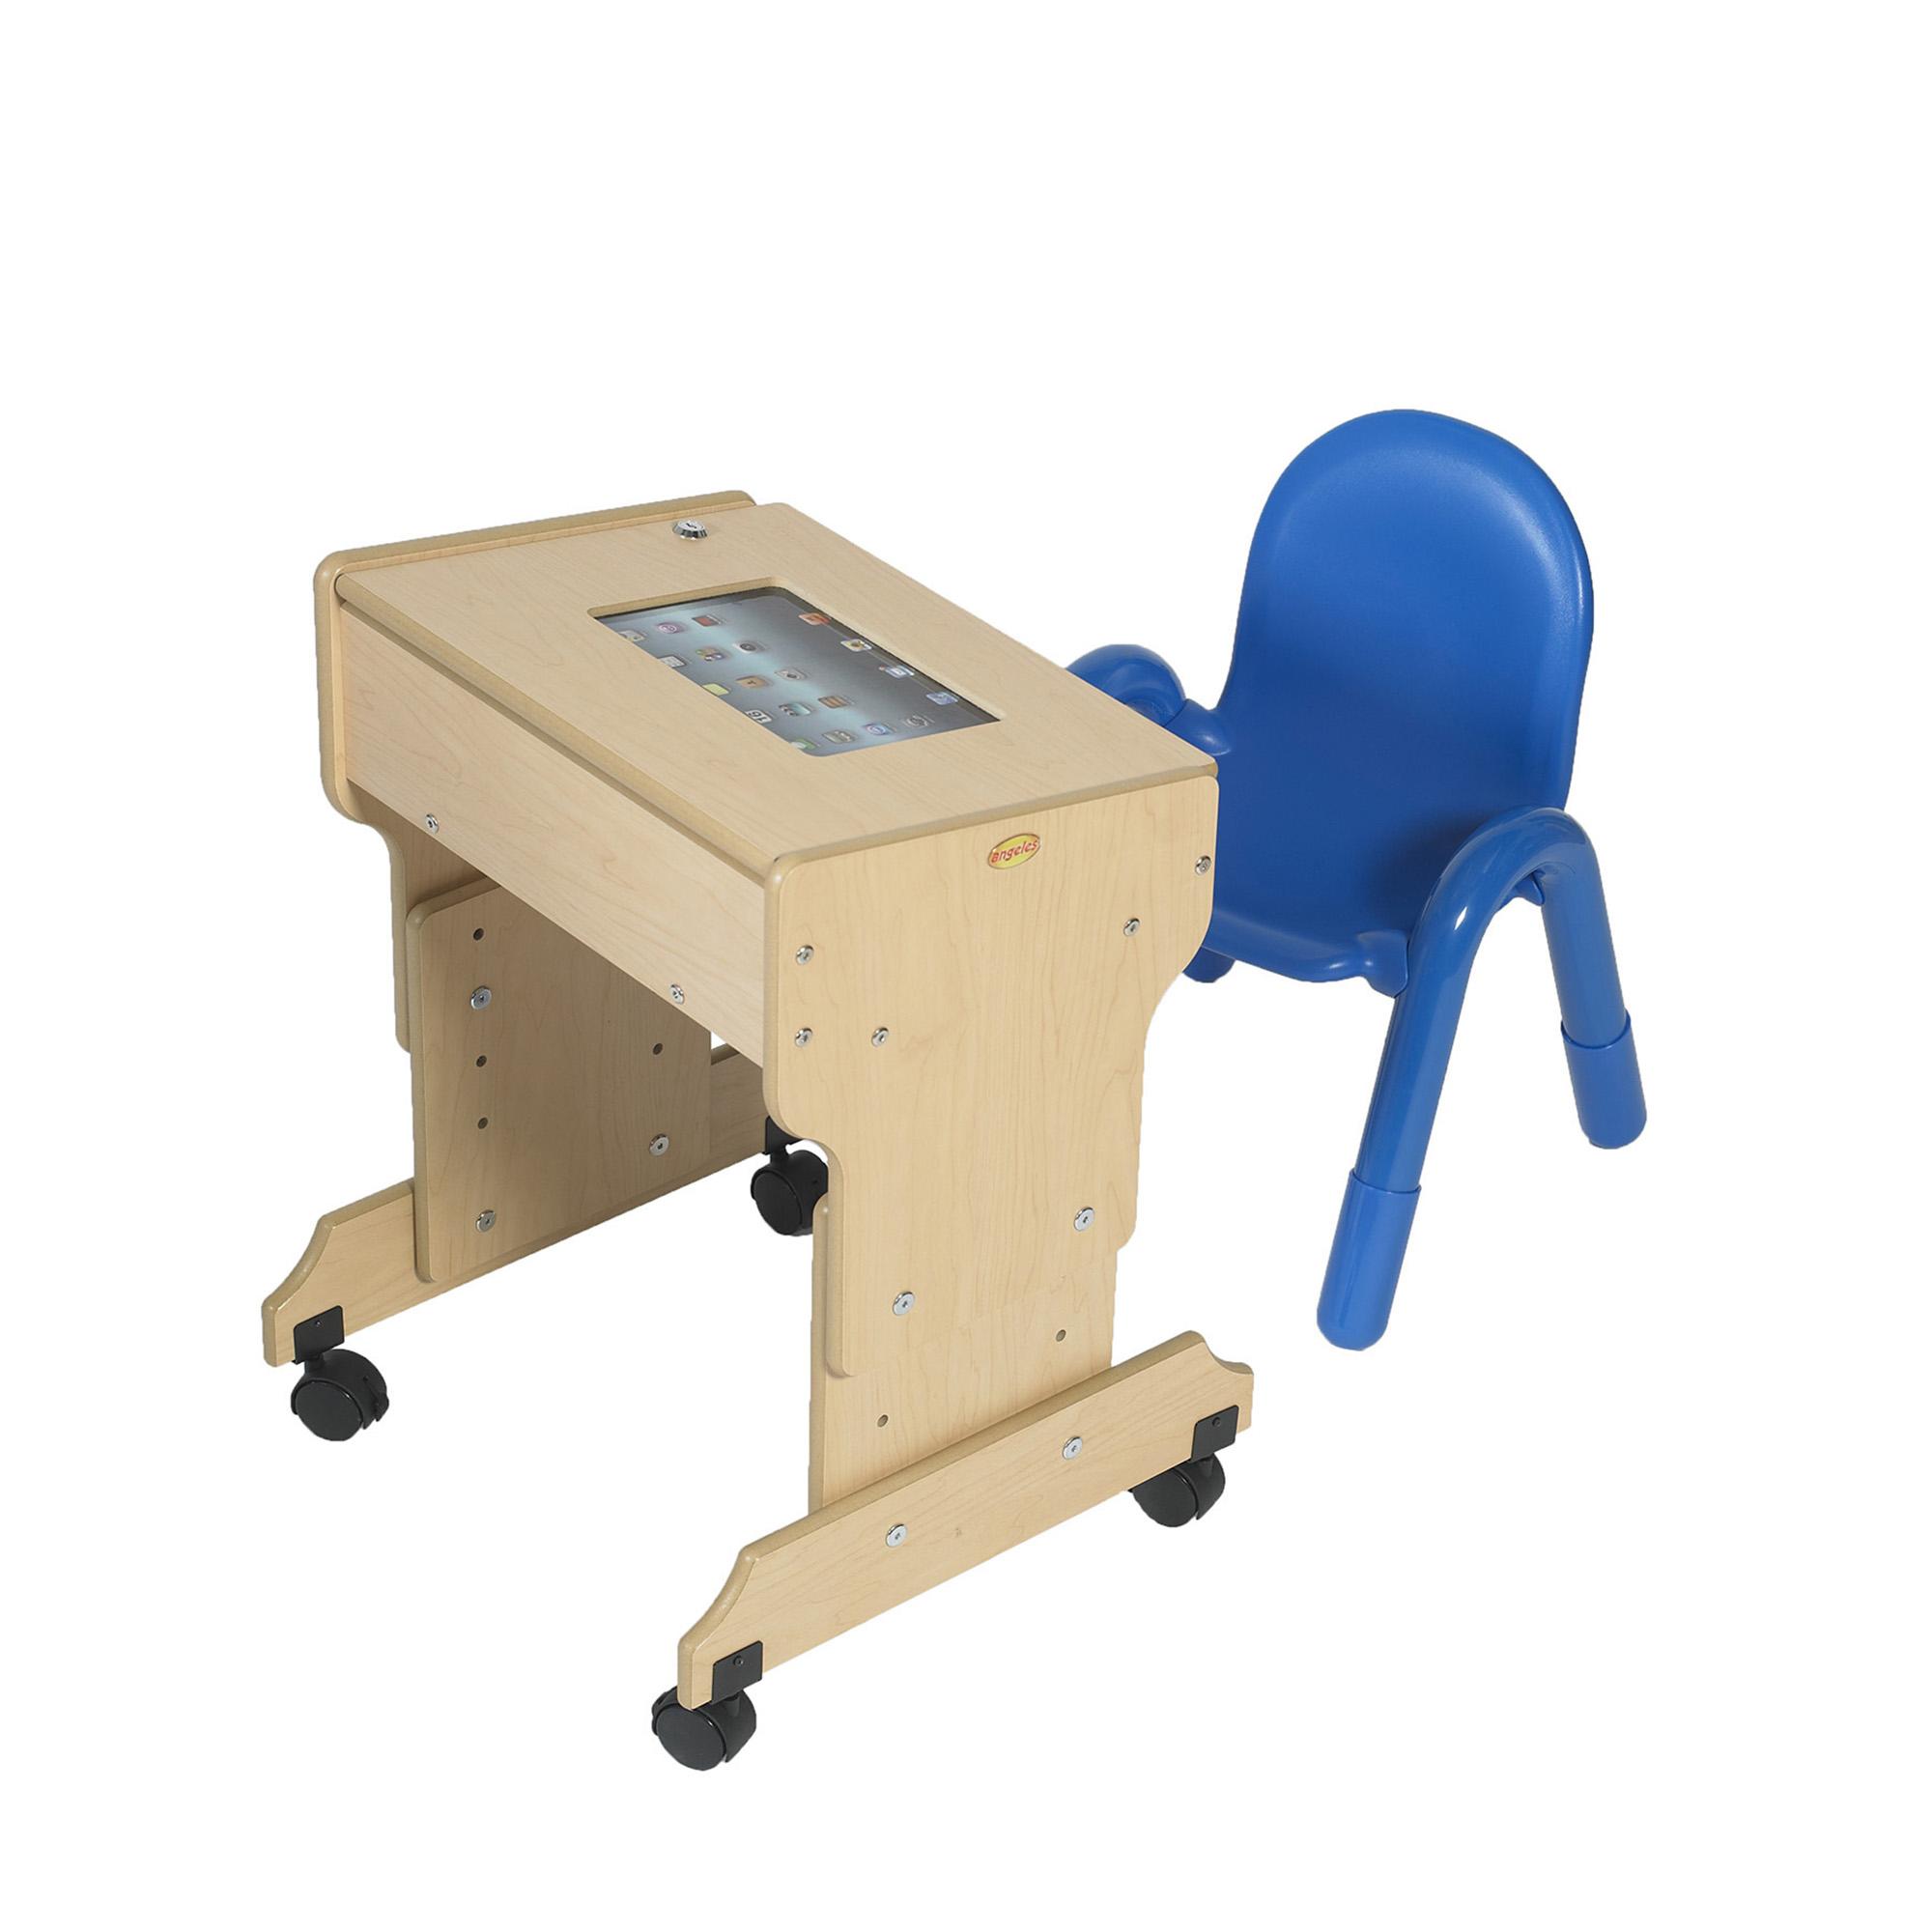 Value Line™ Technology Table - Children's Factory